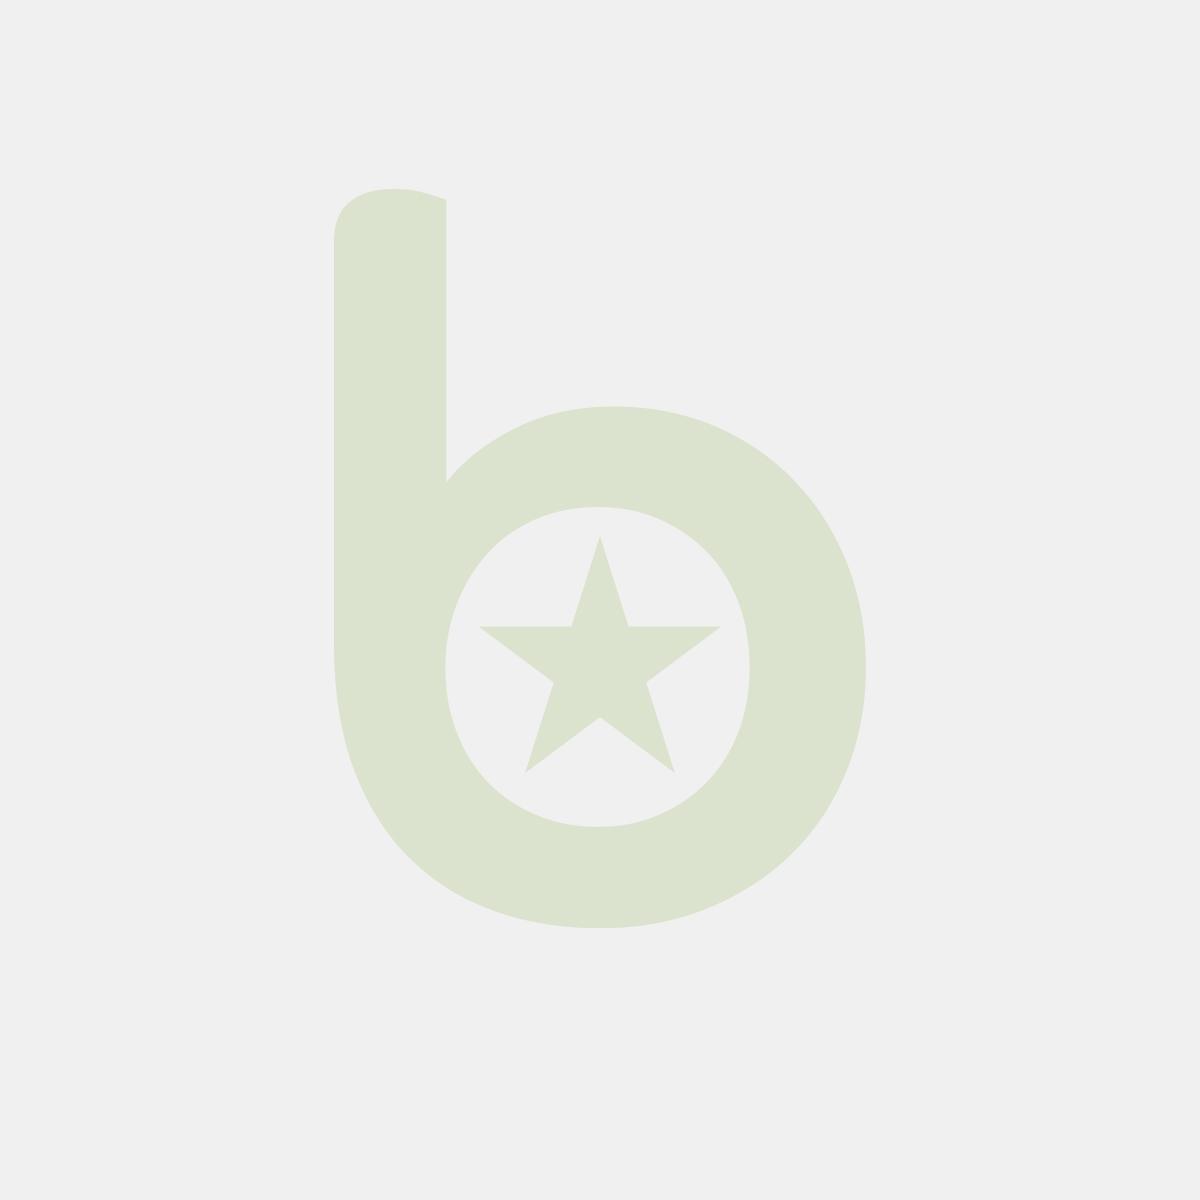 Kołonotatnik Q-CONNECT, A5, w kratkę, 80 kart., 70gsm, perforacja